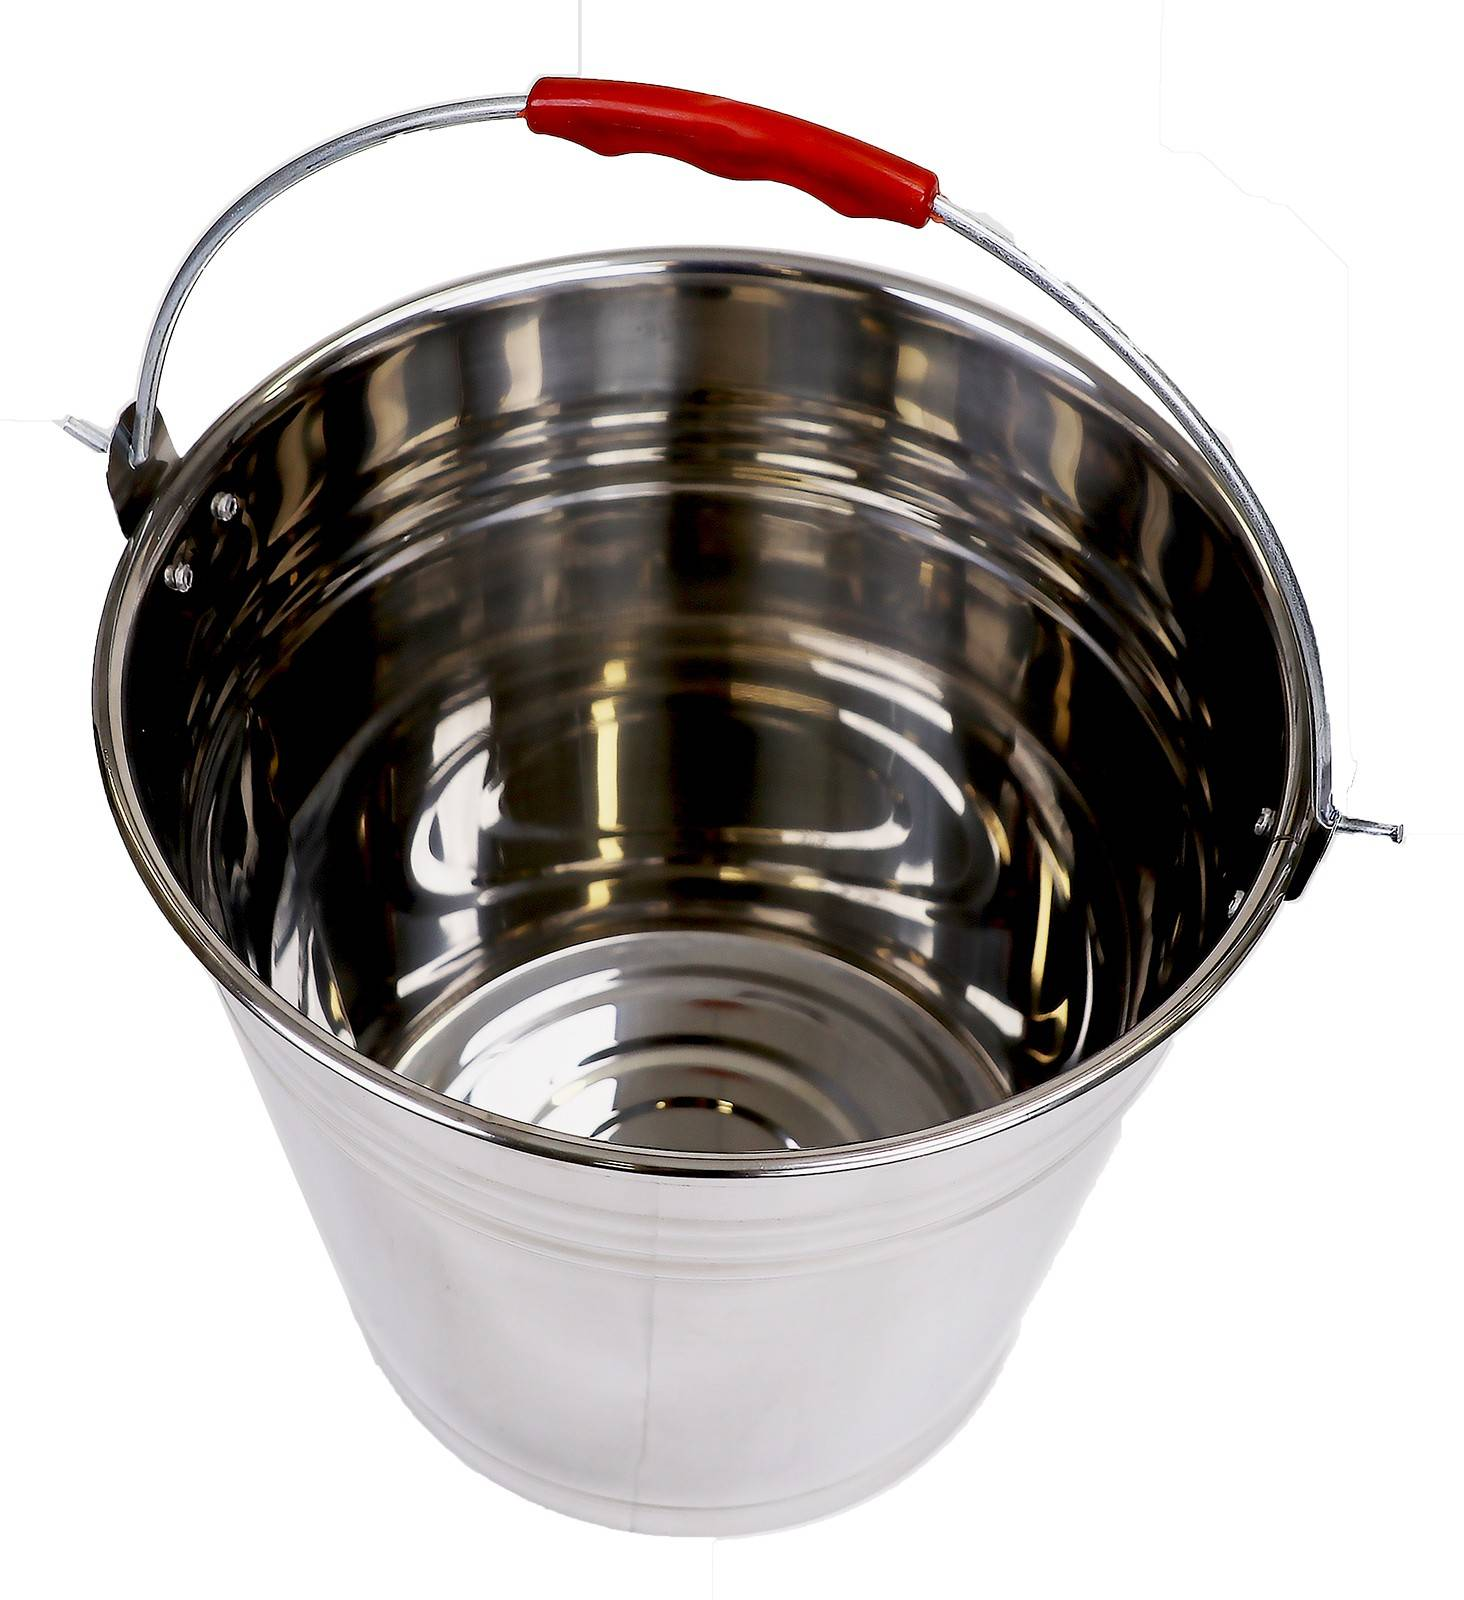 Stainless Steel Bucket 10 Litre